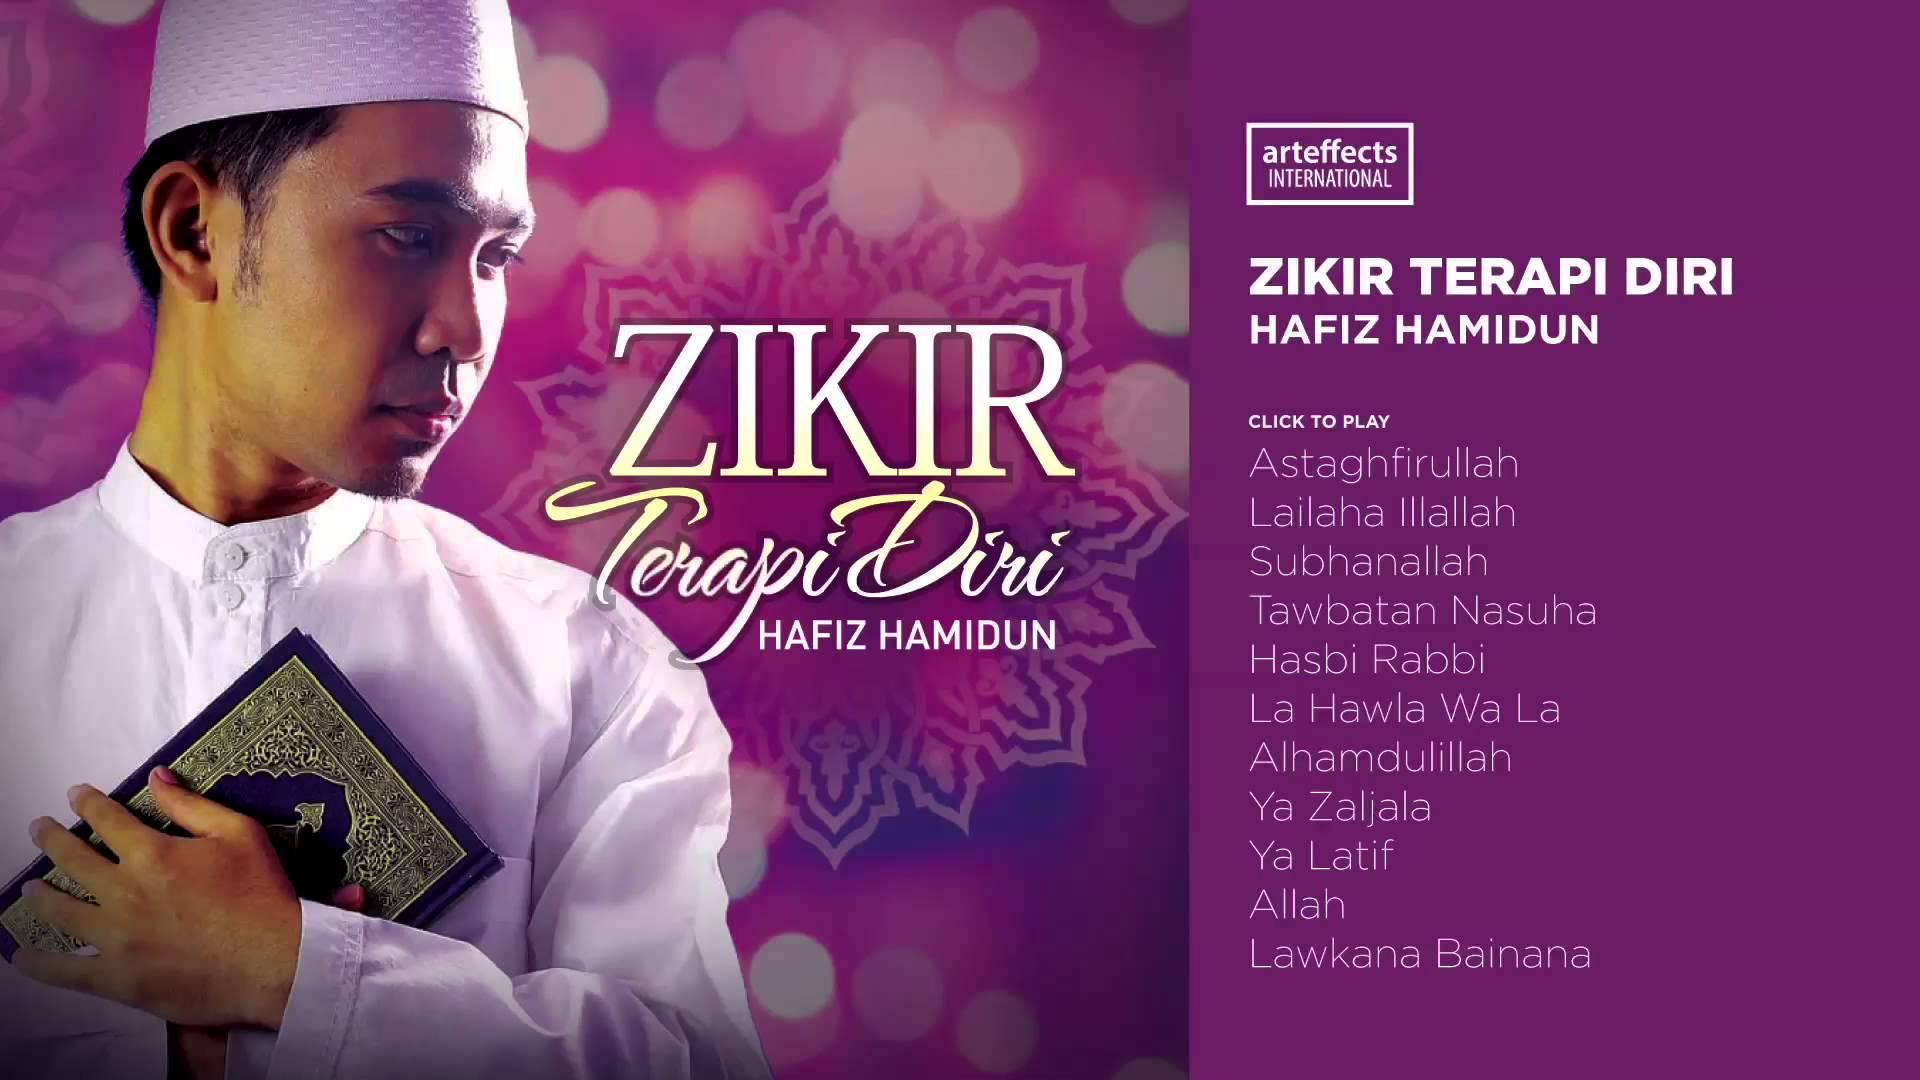 Zikir terapi diri 3   hafiz hamidun – download and listen to the album.